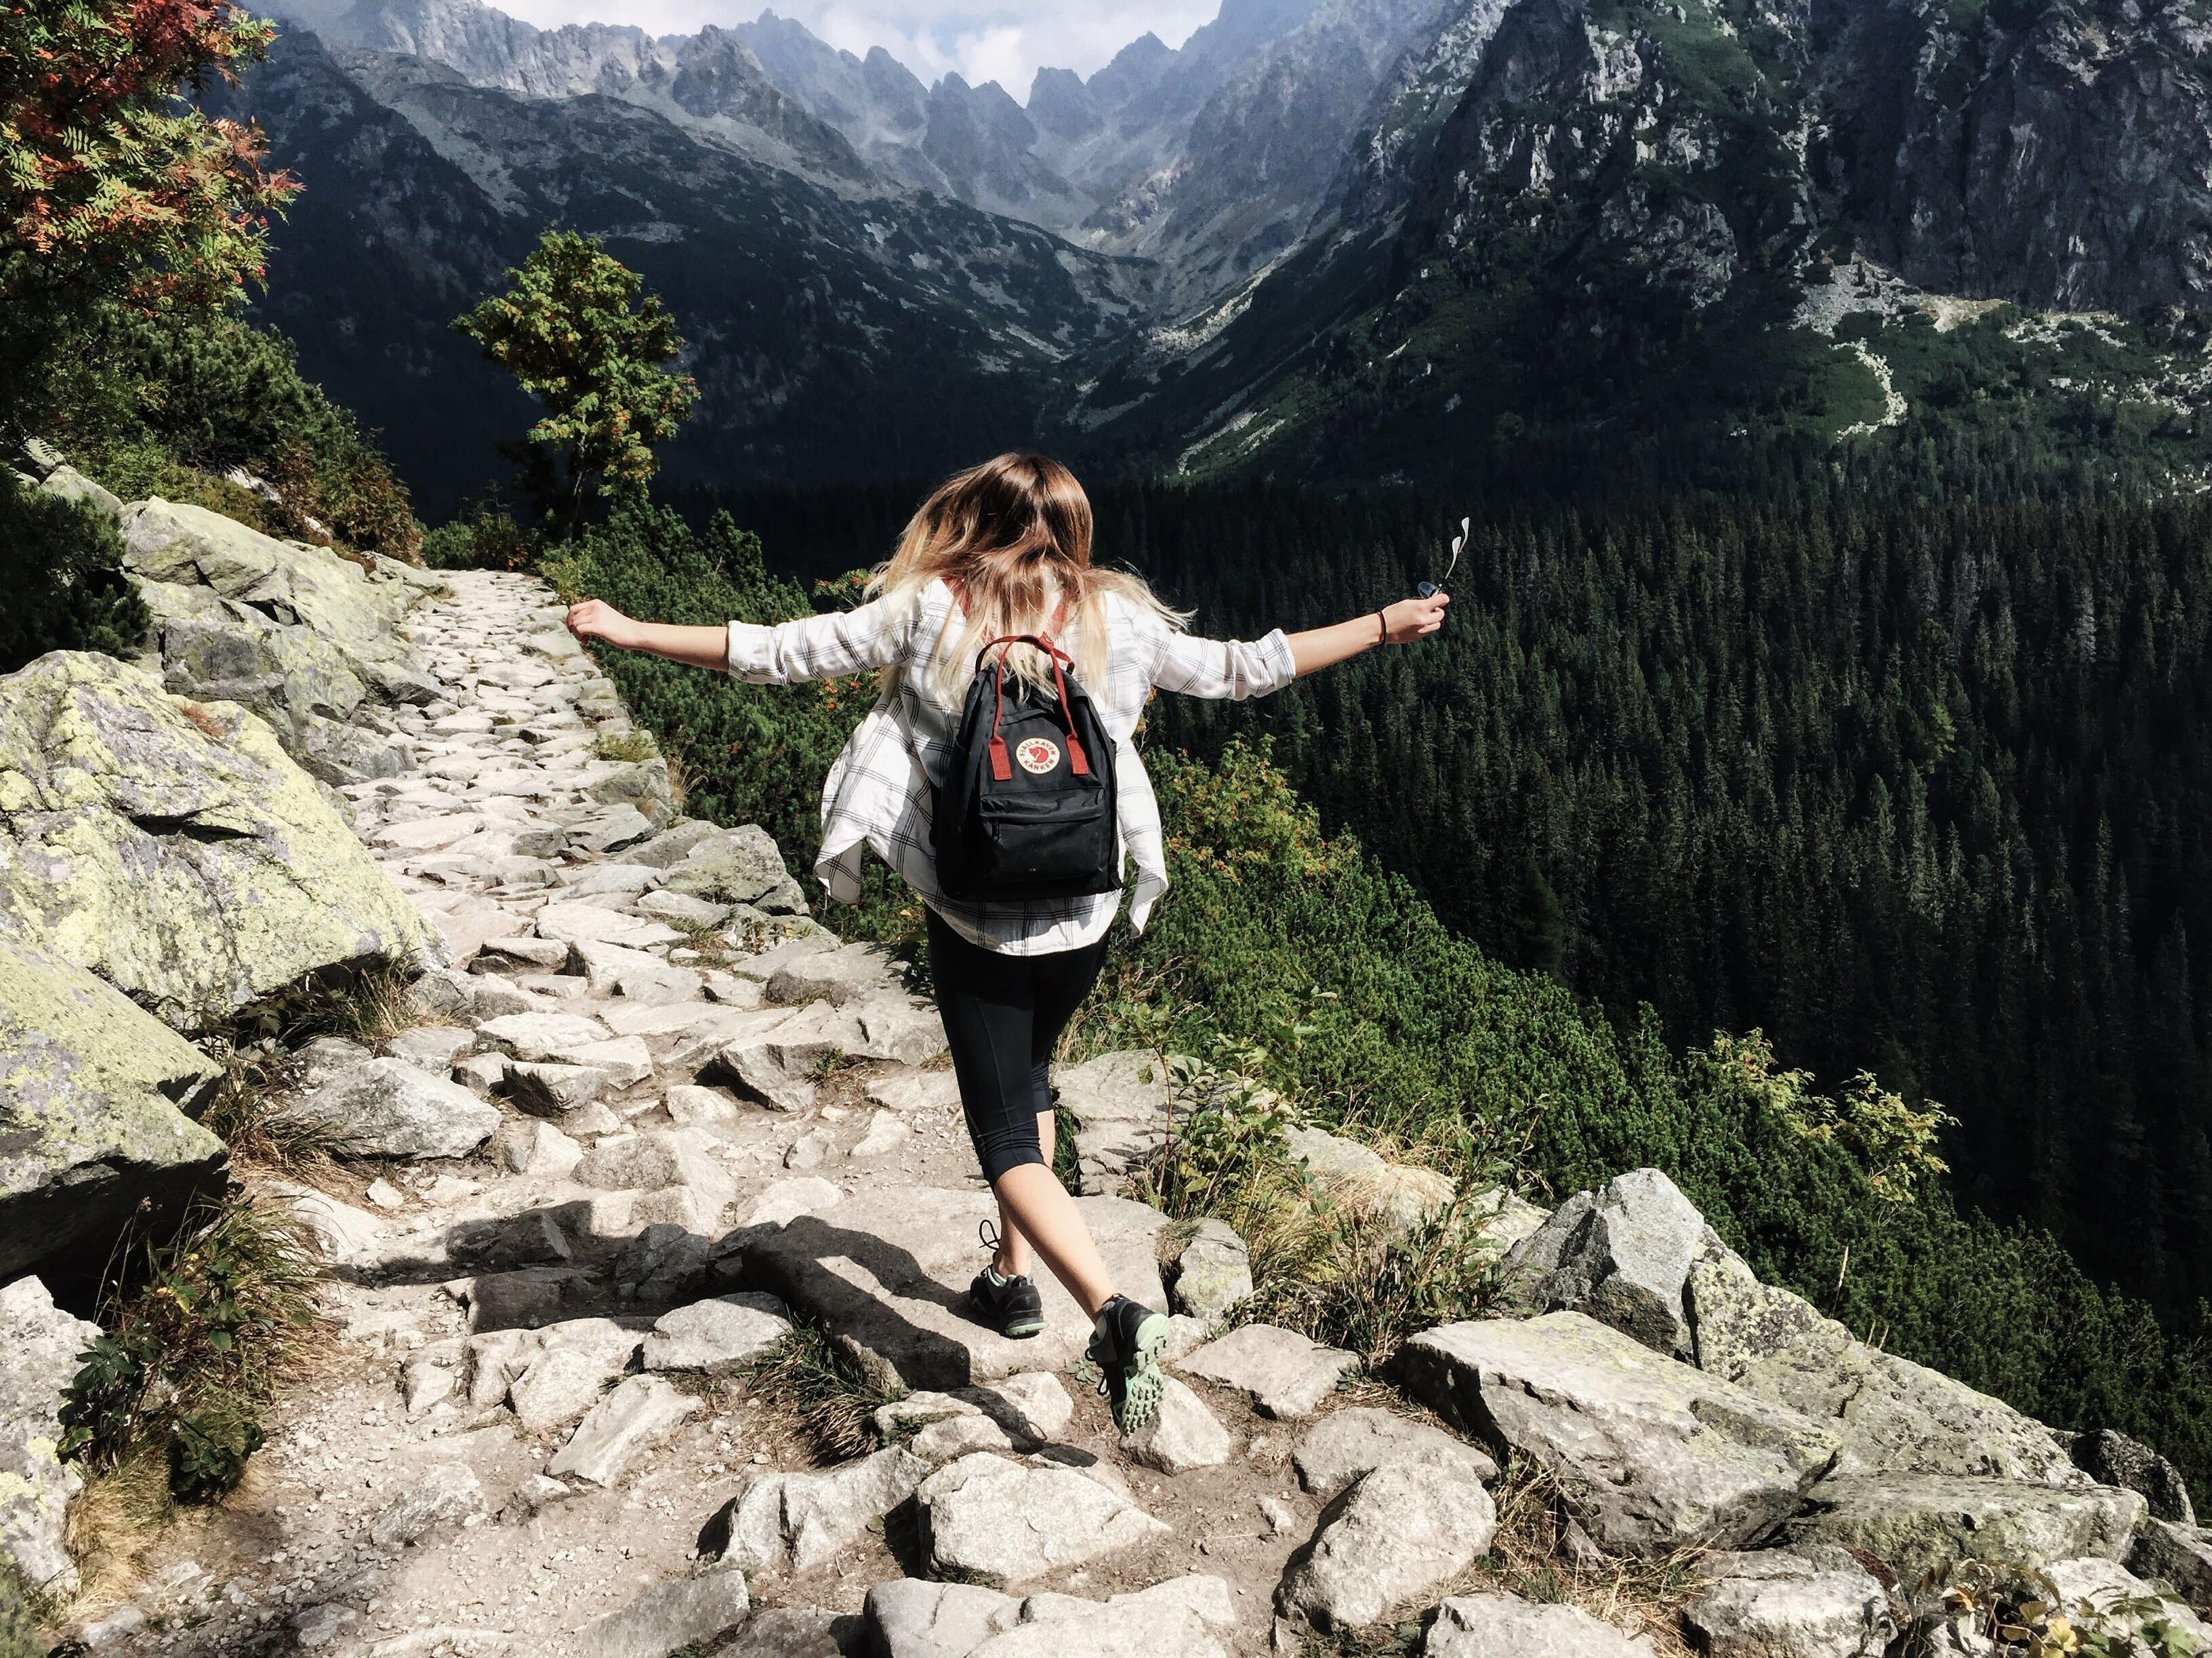 Auslandsaufenthalt in Kanada